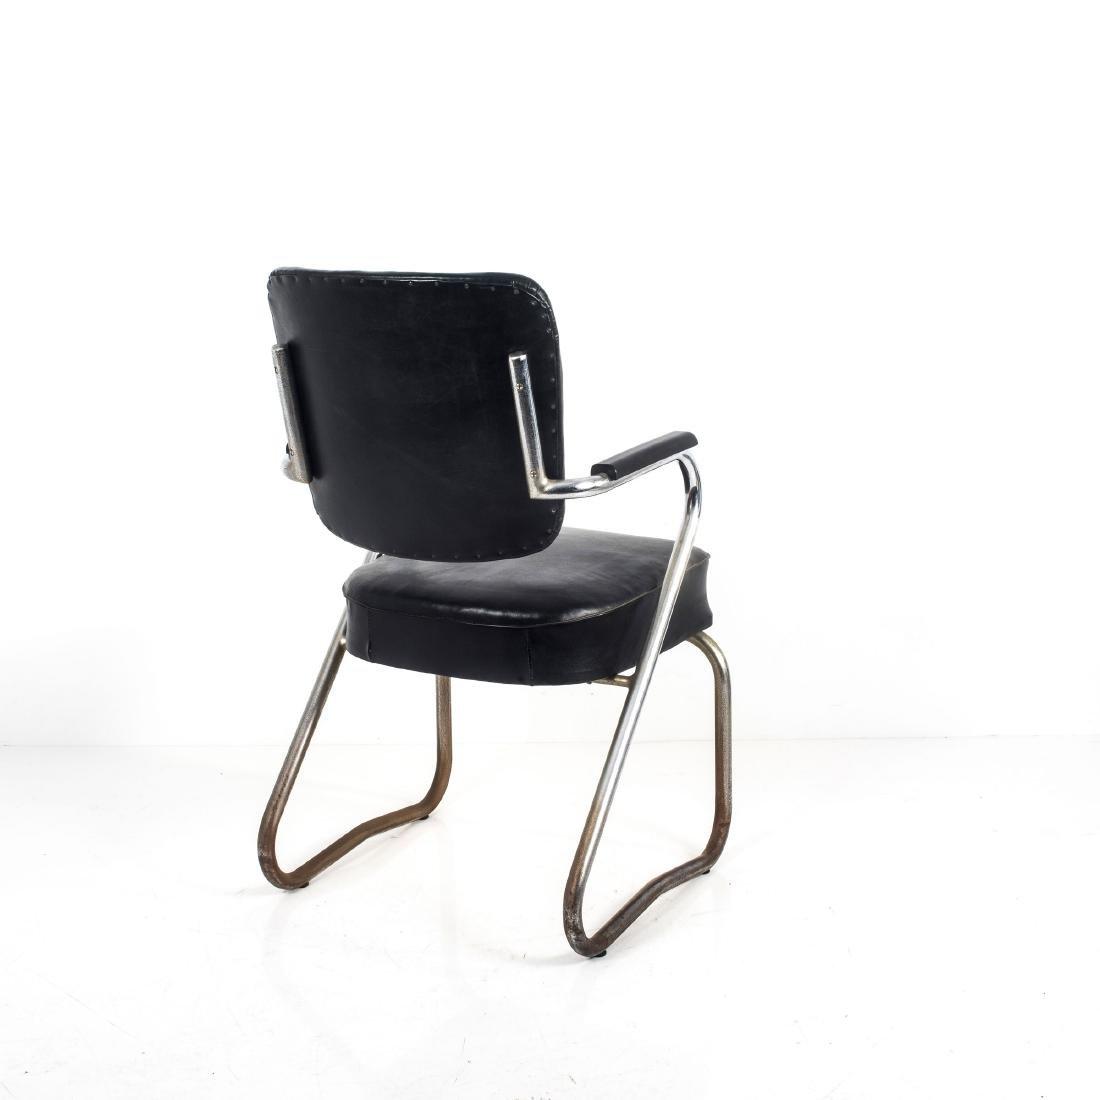 Tubular steel chair, c. 1935 - 6